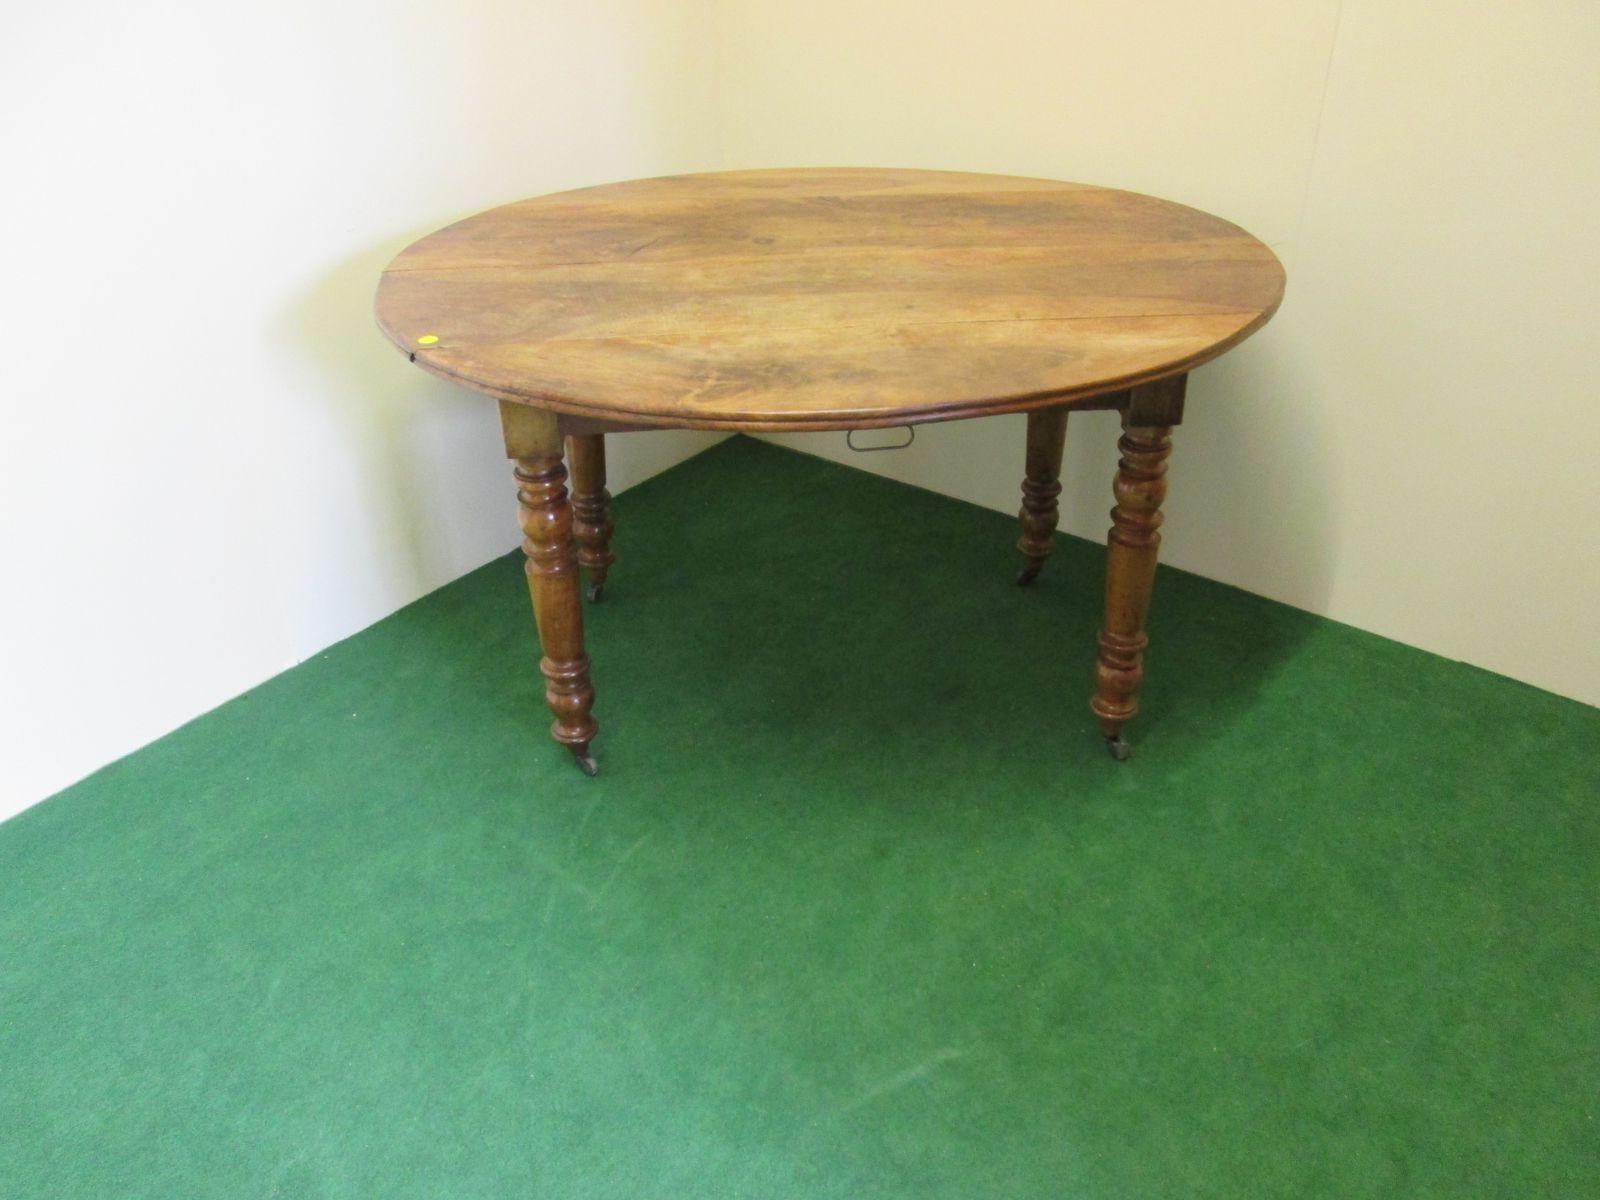 table de salle manger ovale extensible antique en vente. Black Bedroom Furniture Sets. Home Design Ideas